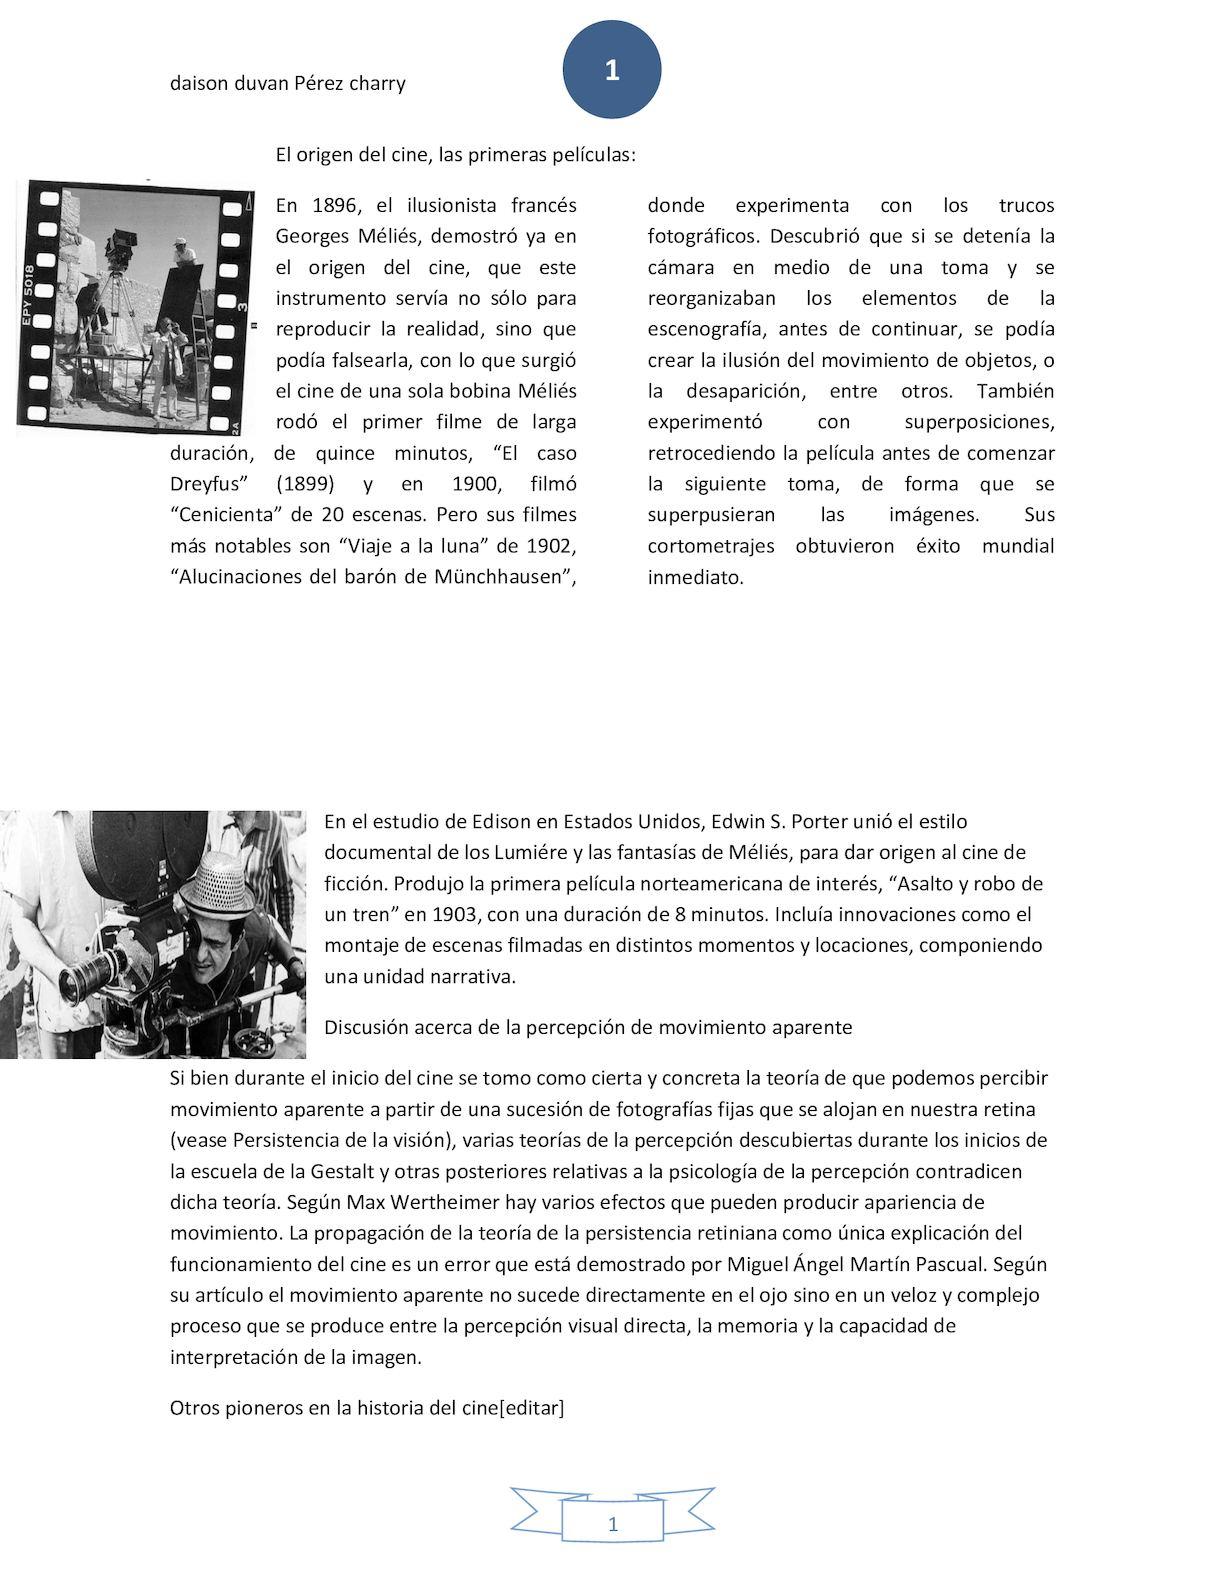 b8e8315e0 Calaméo - Historia De Cine Daison 1